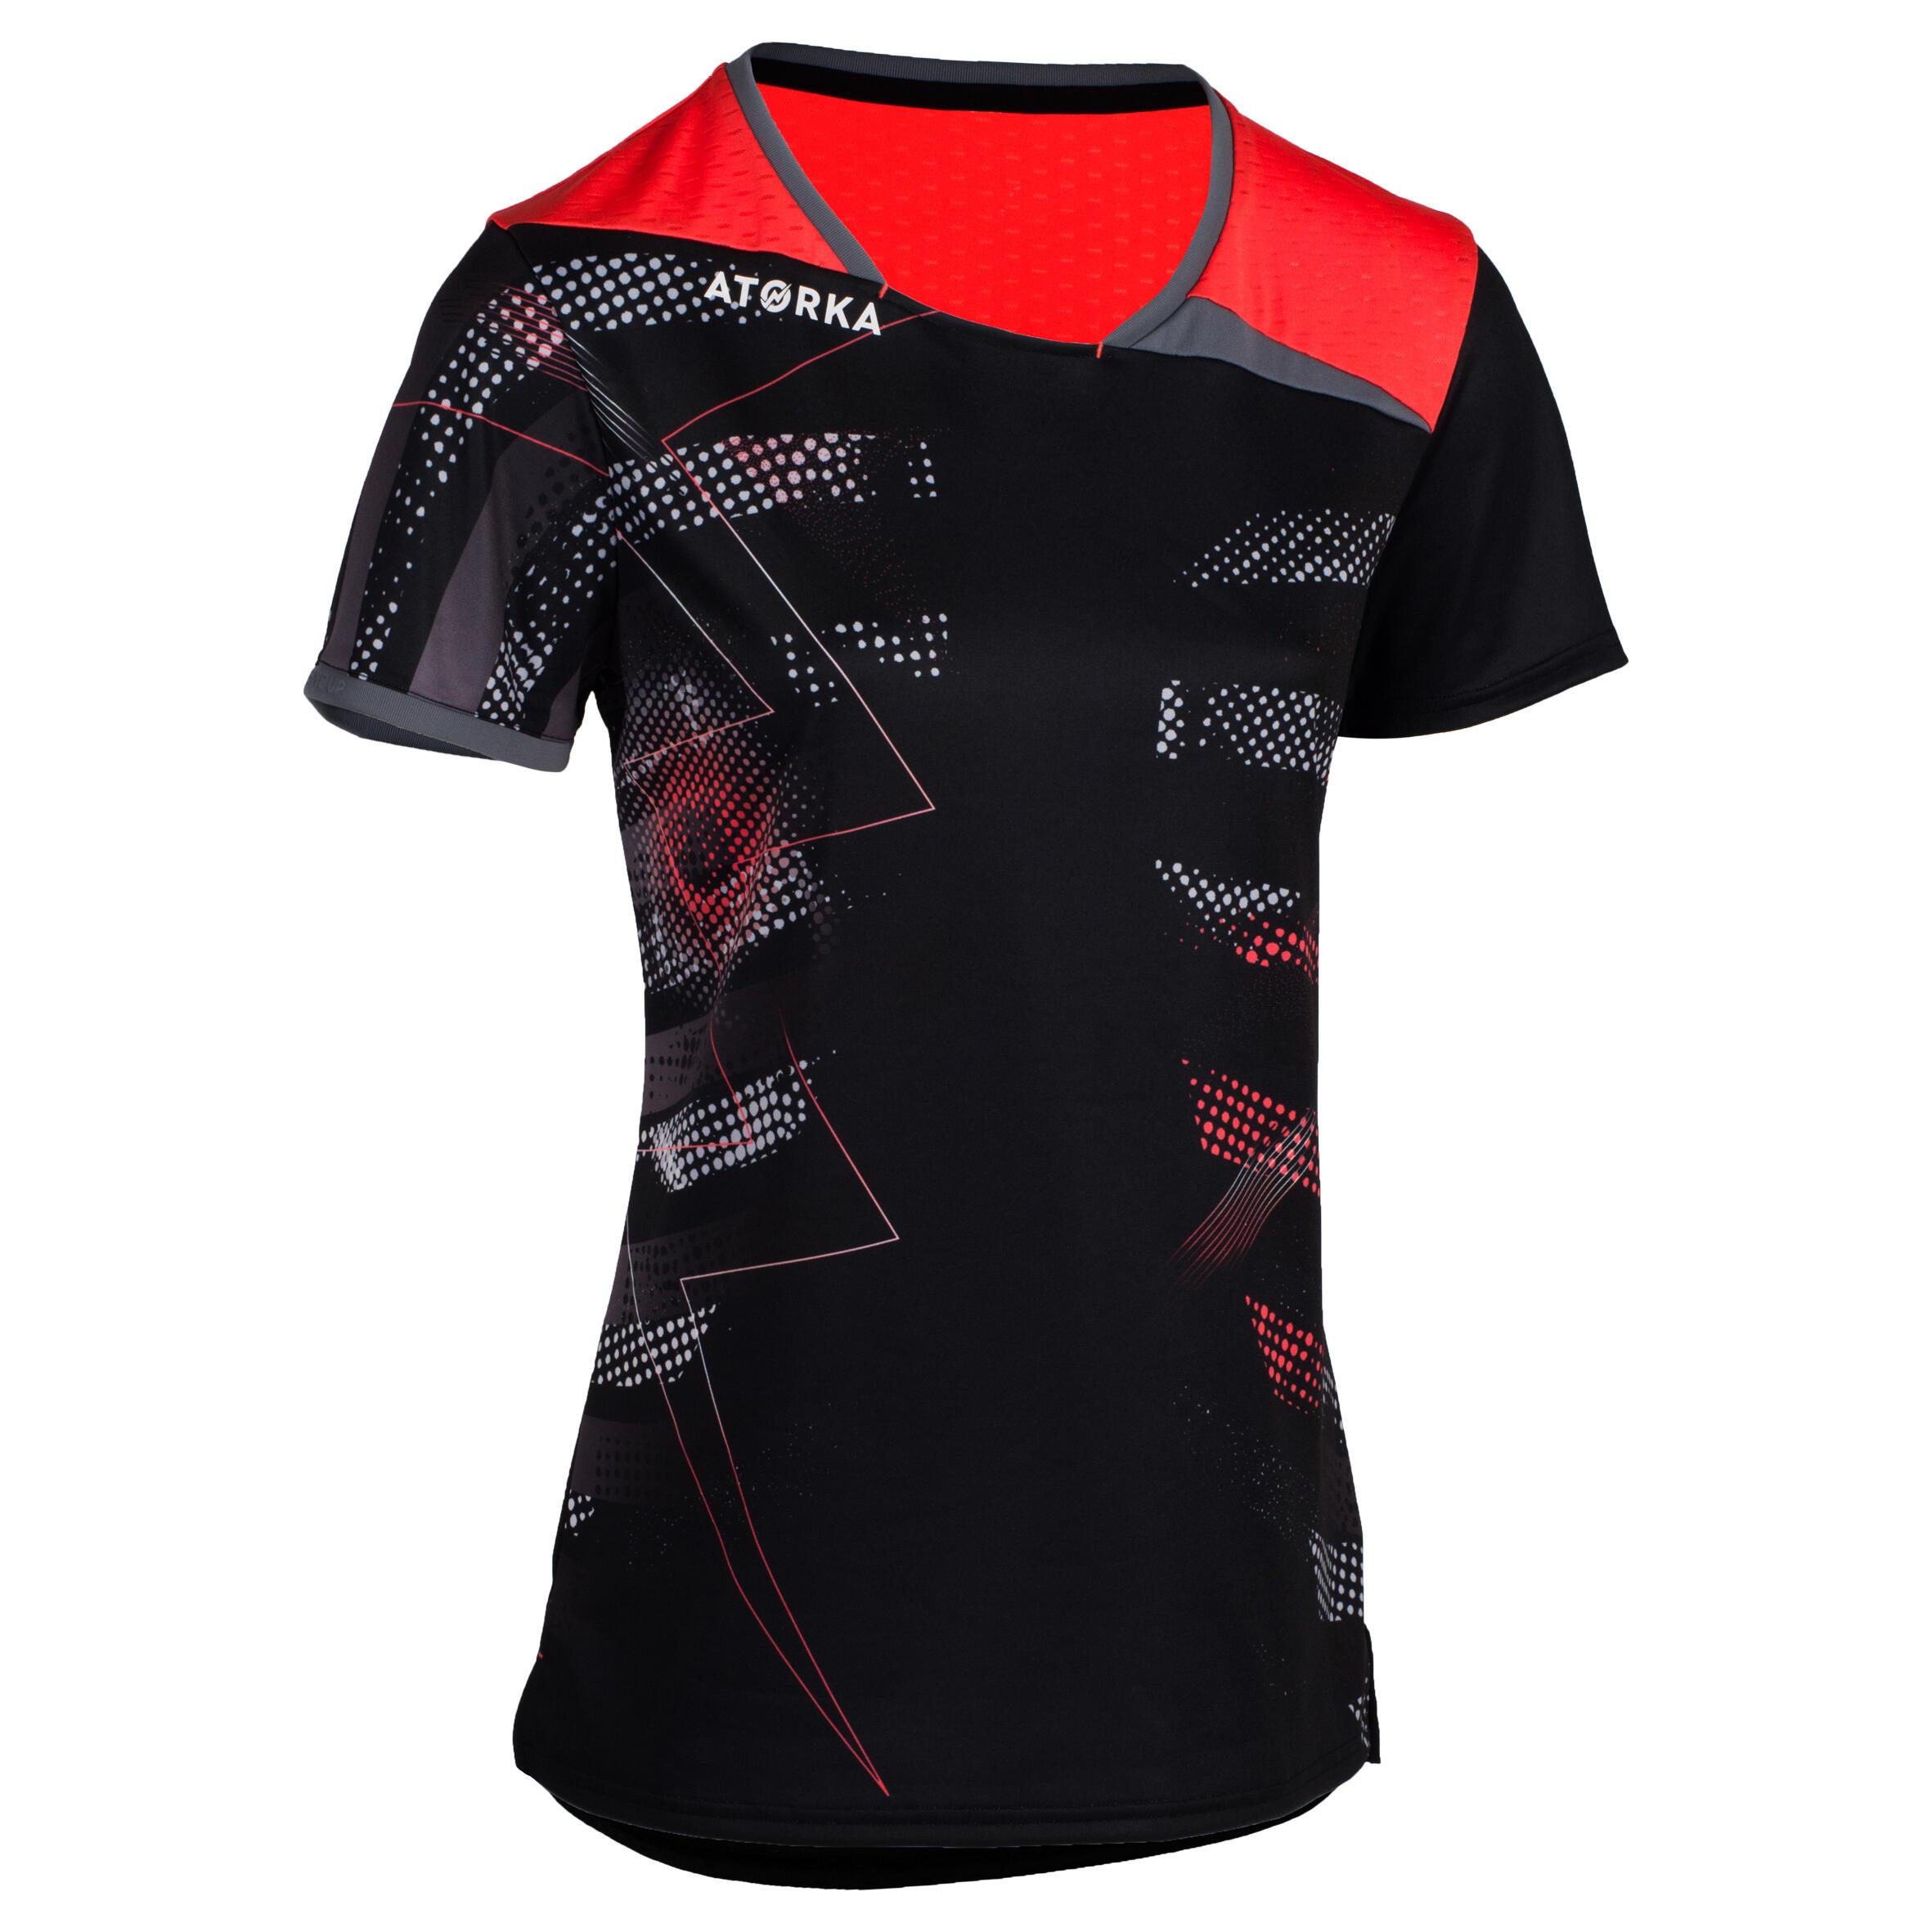 Handballtrikot H500 Damen schwarz/rosa | Sportbekleidung > Trikots > Handballtrikots | Schwarz - Rosa | Atorka